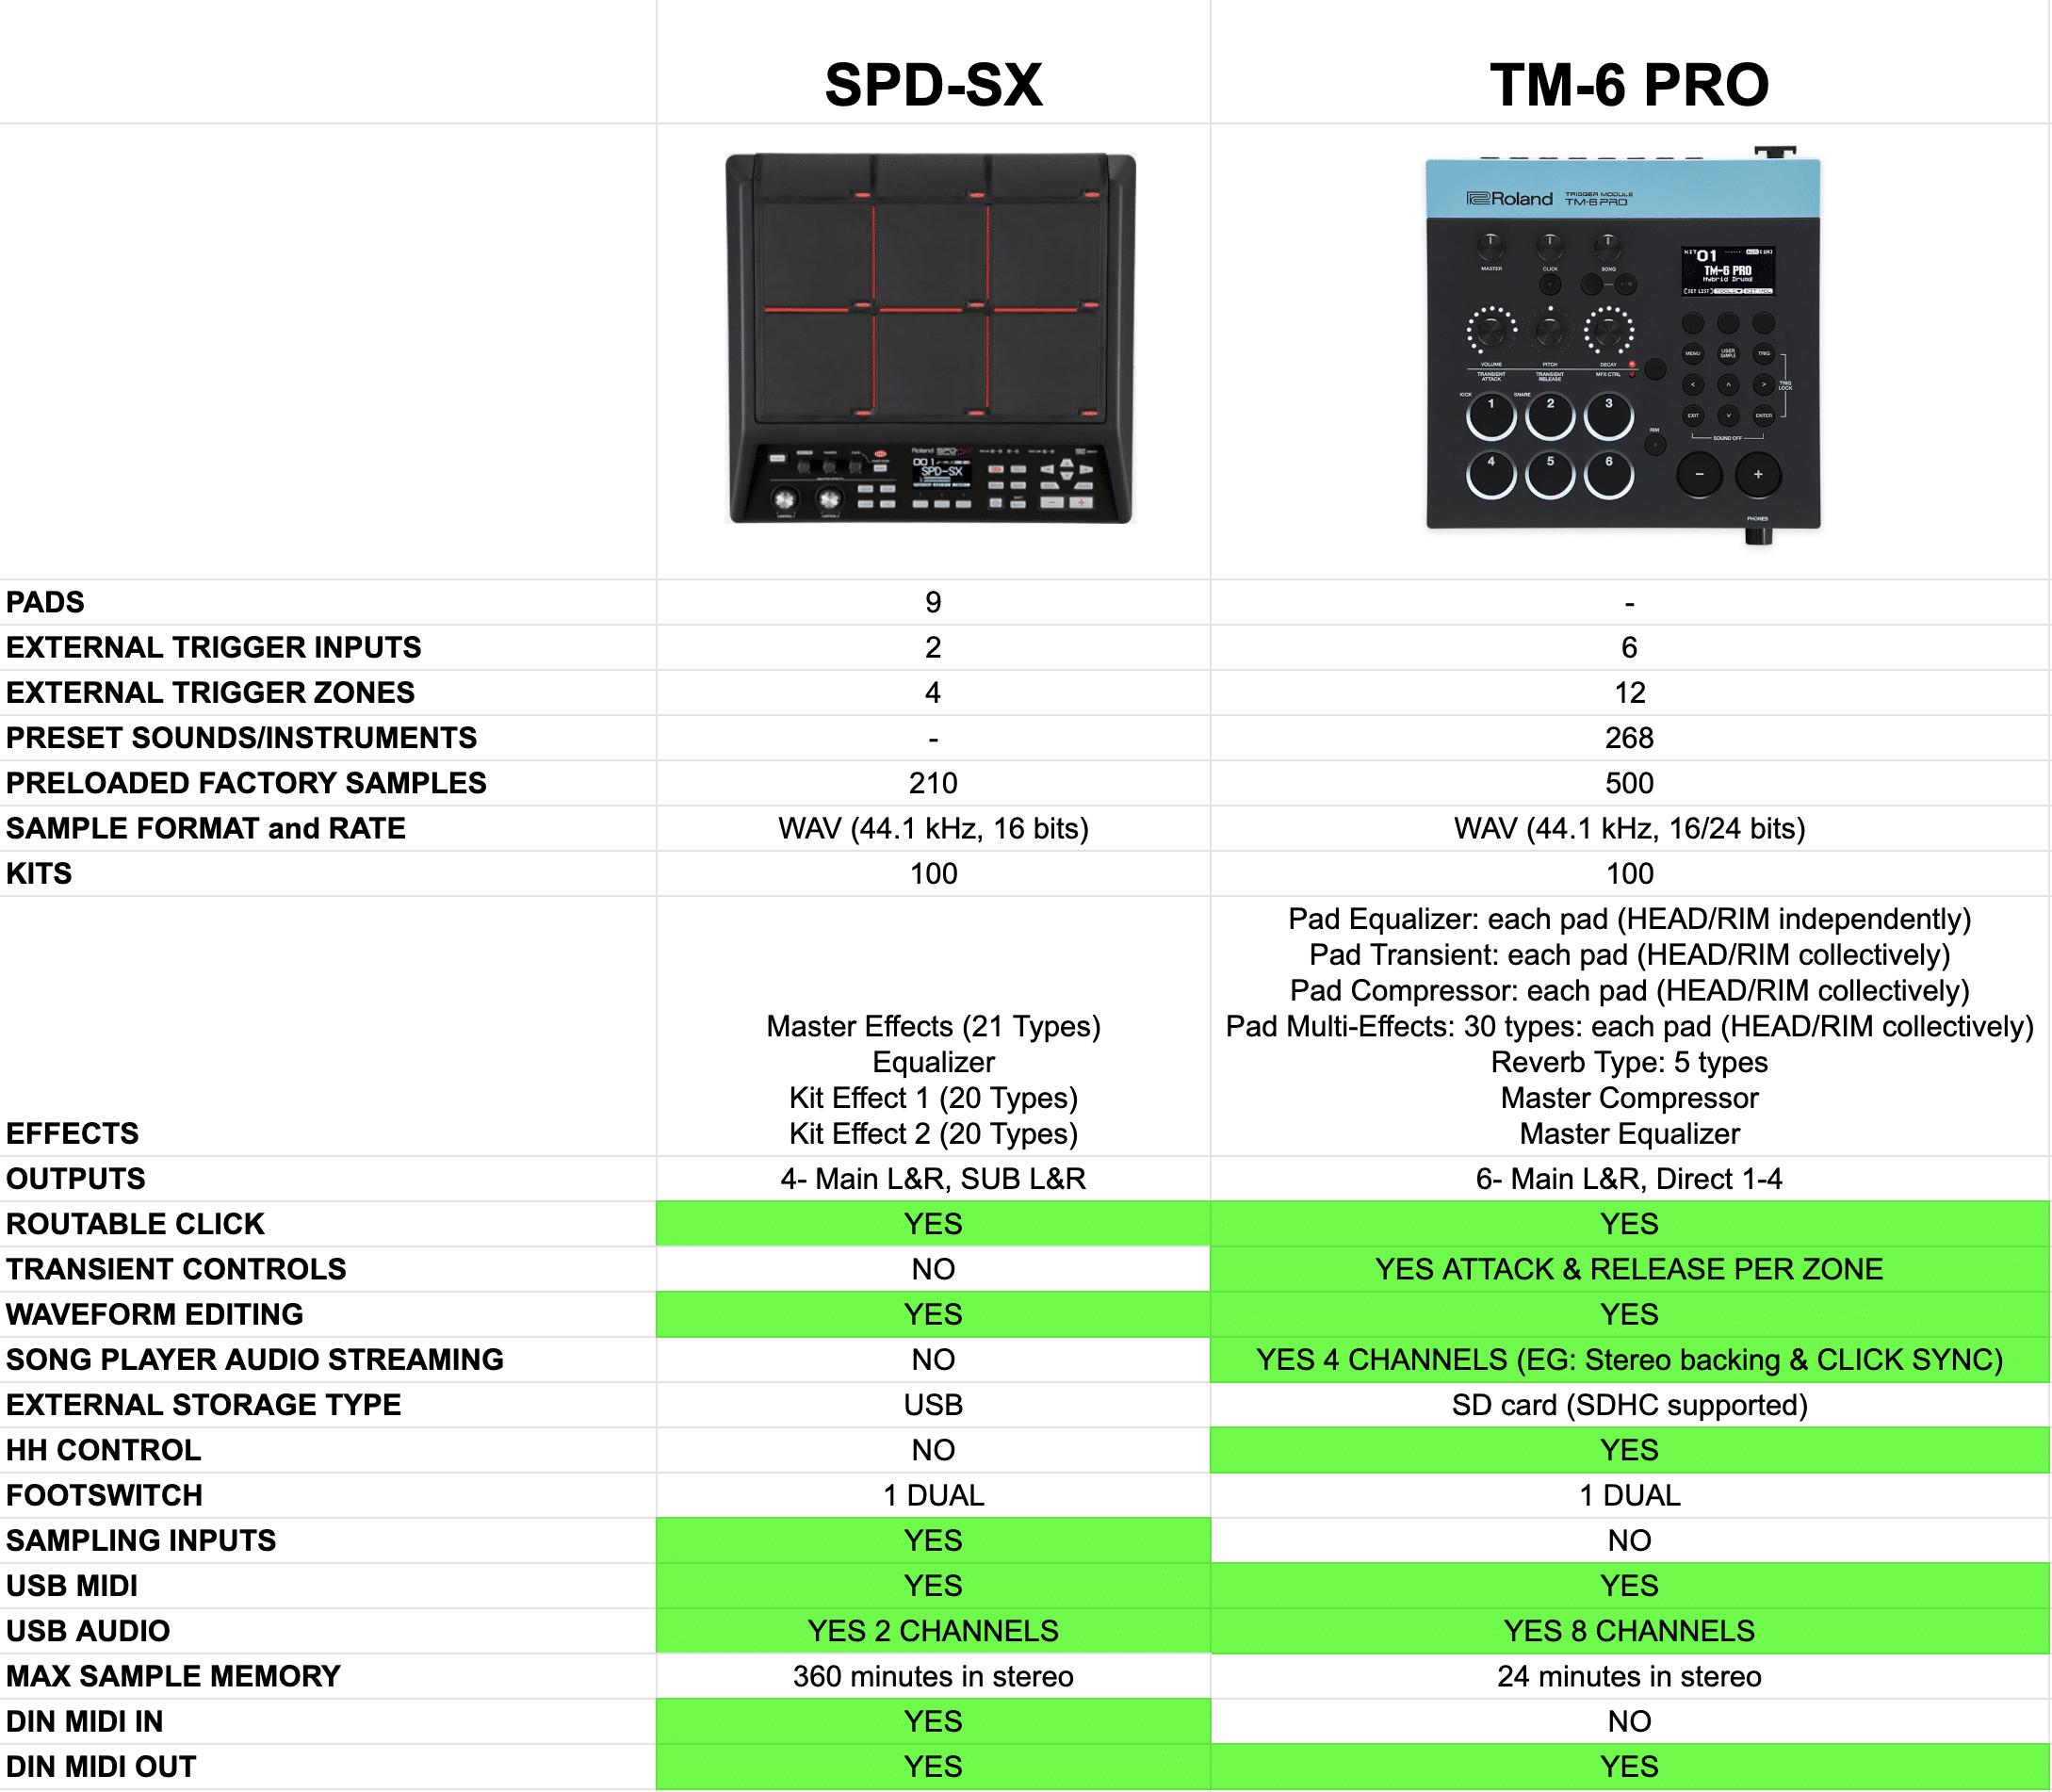 SPD-SX vs TM-6Pro